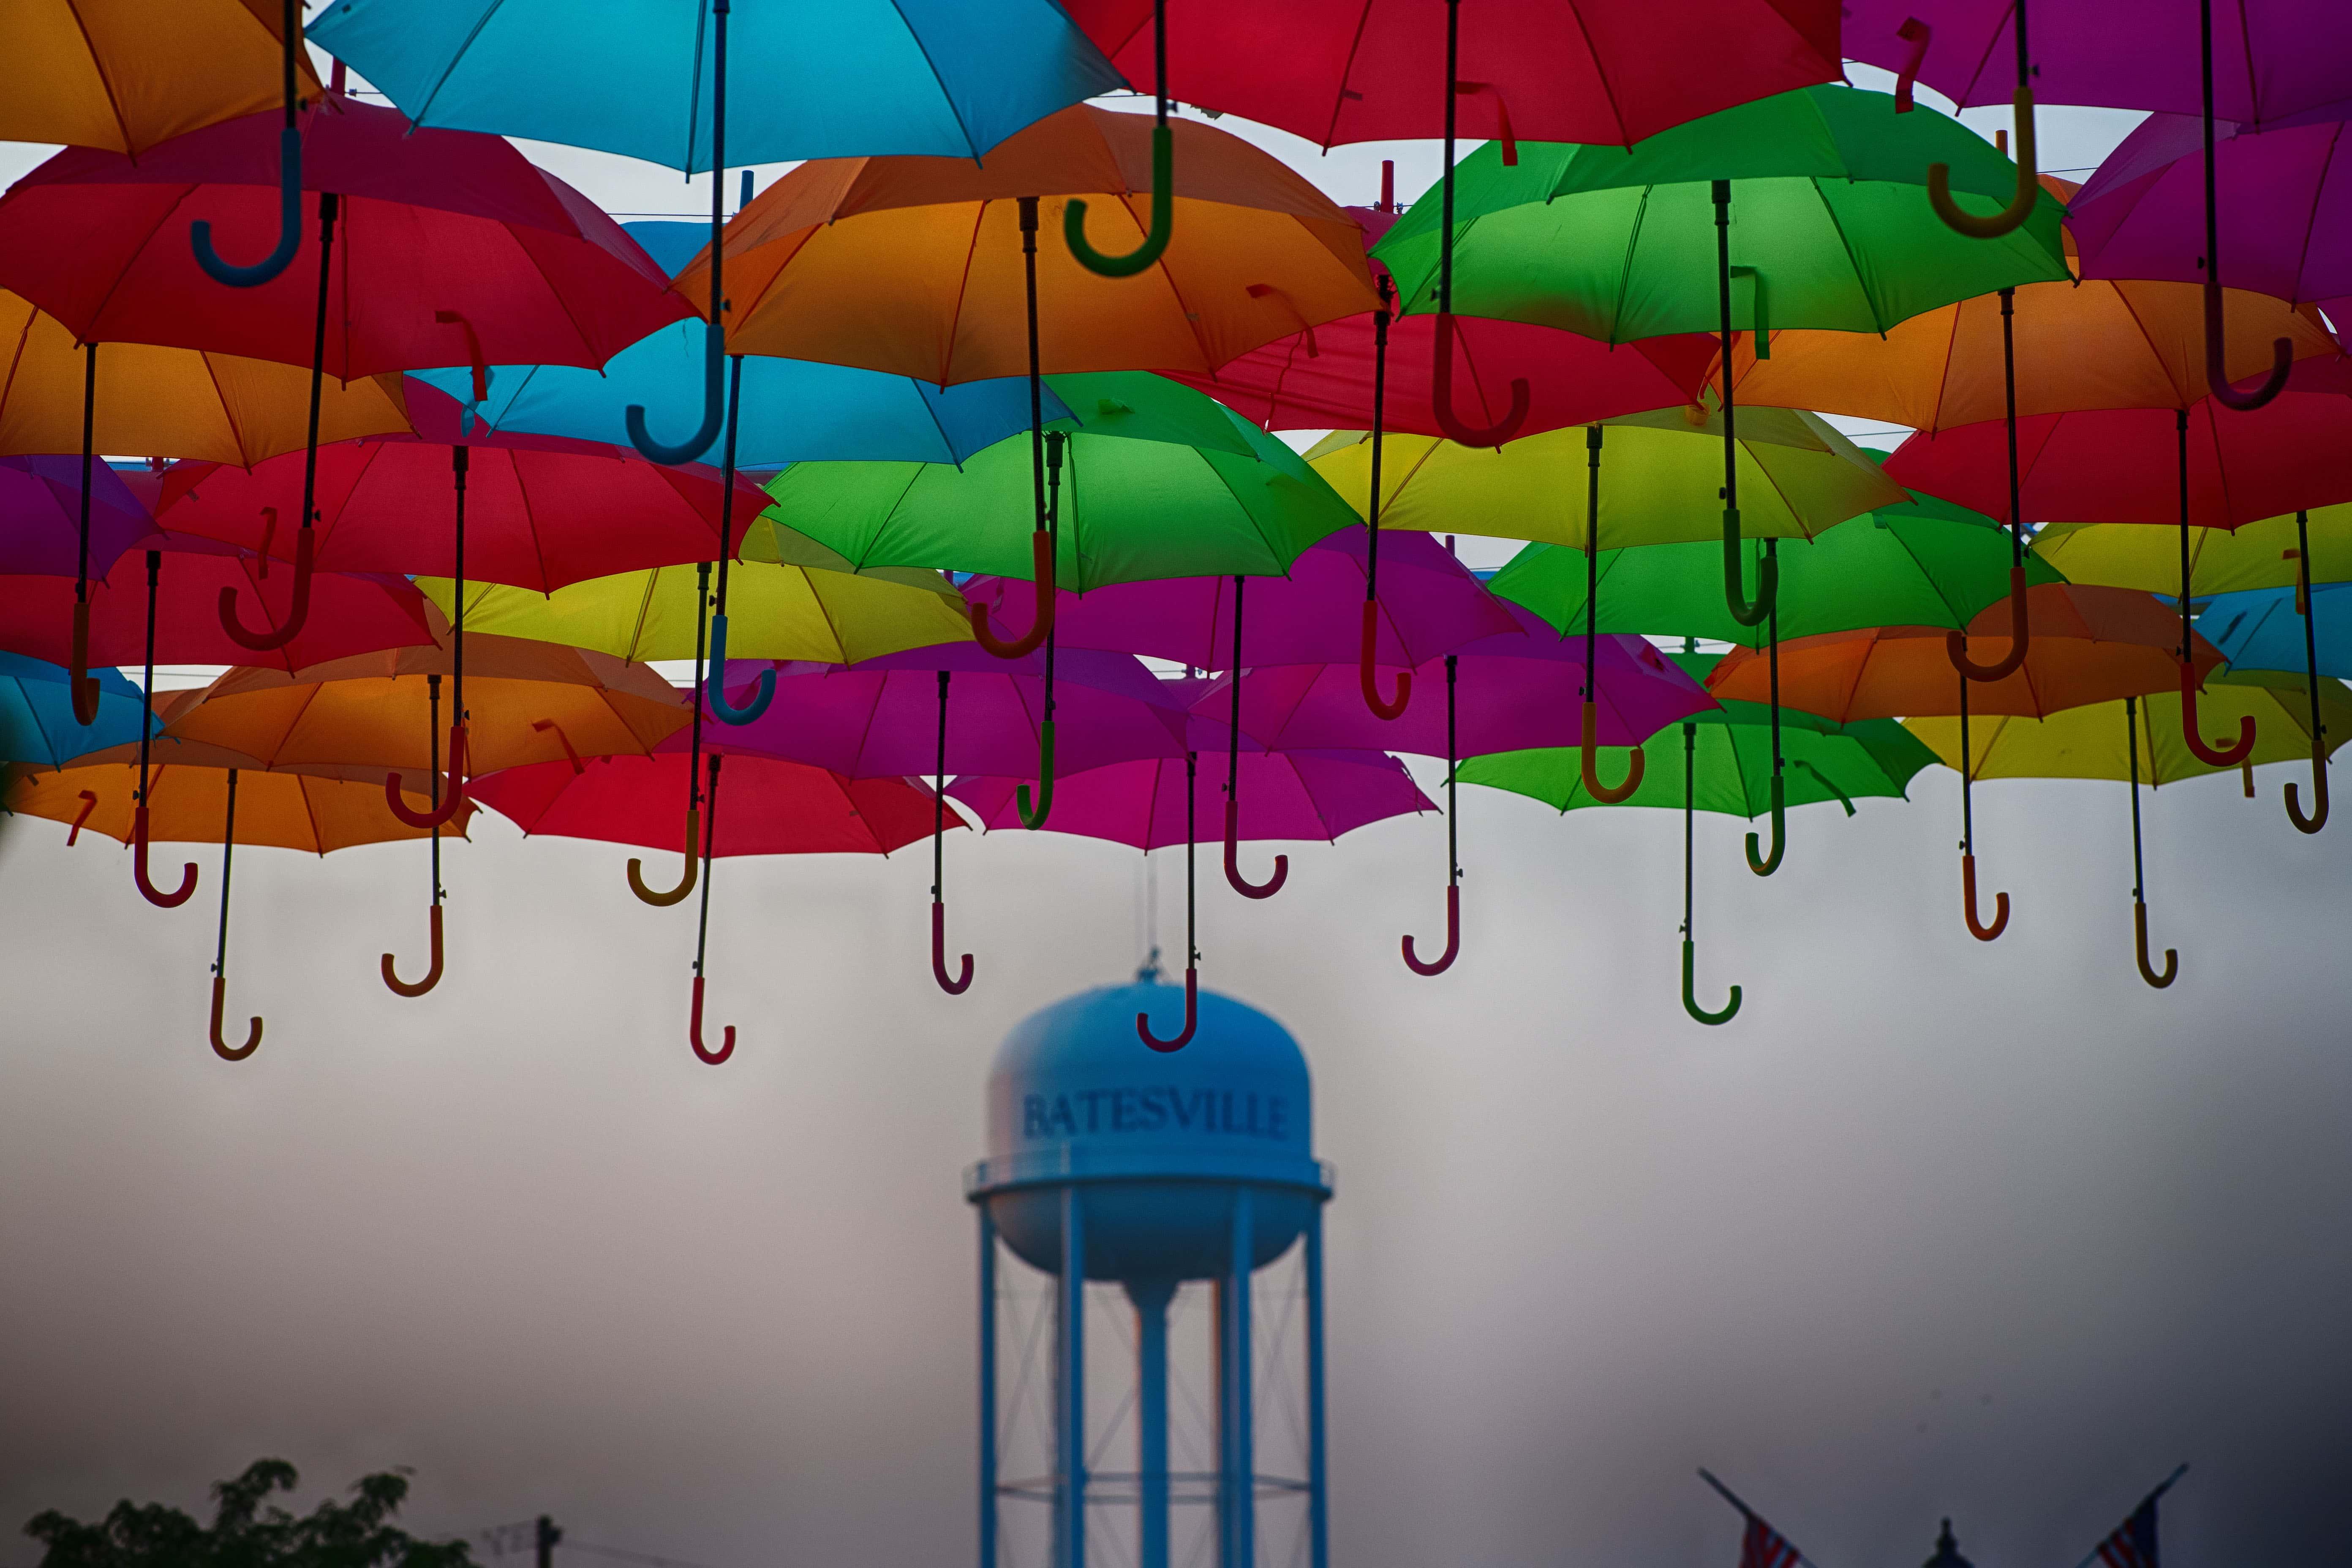 Beautiful Umbrella art